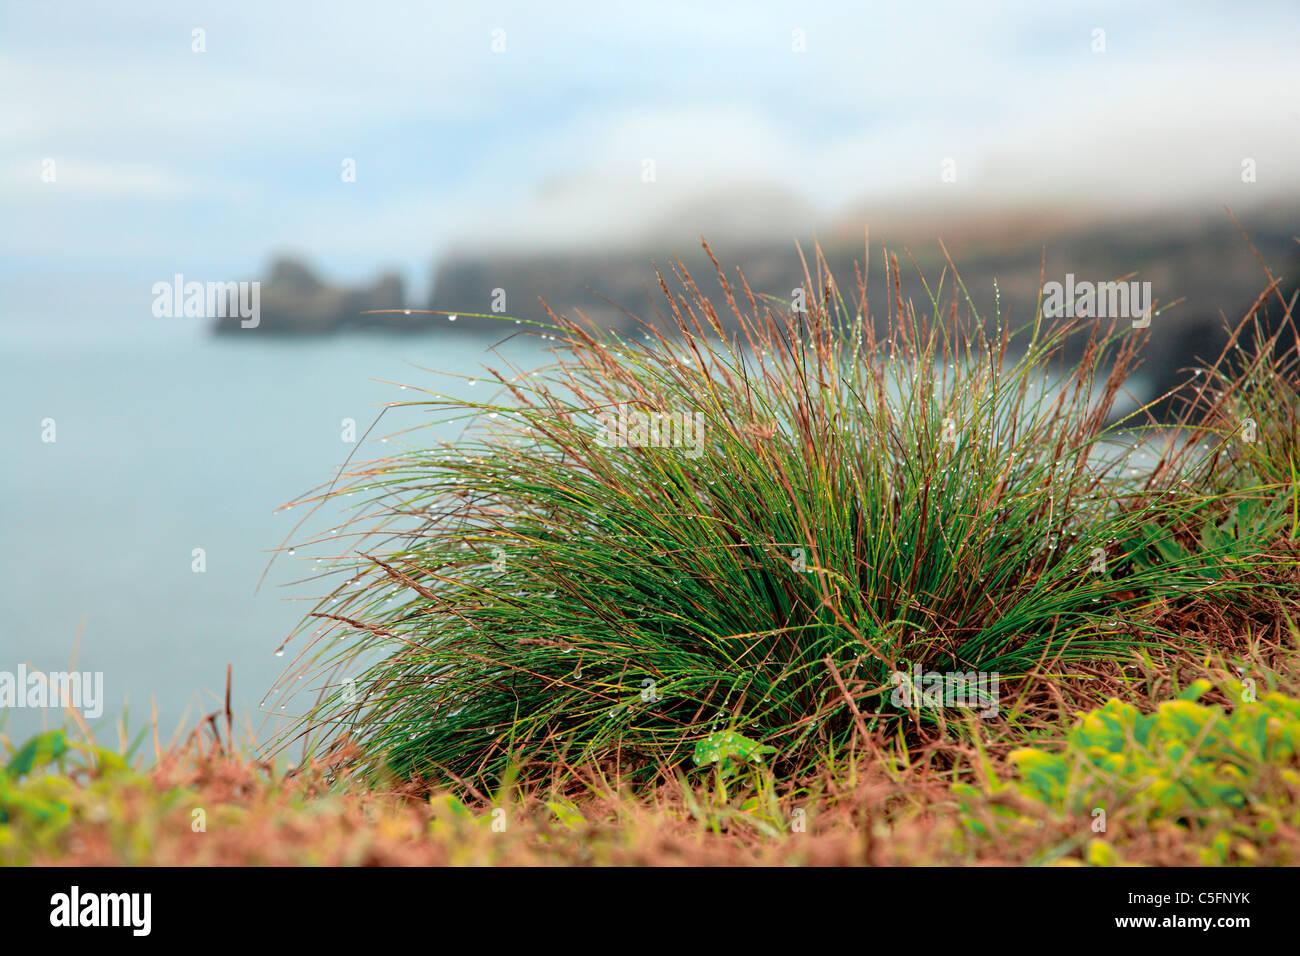 Isole Azzorre flora endemica: Festuca petraea Guthnick. Nome portoghese è 'bracel-da-rocha' o 'braceu'. Immagini Stock